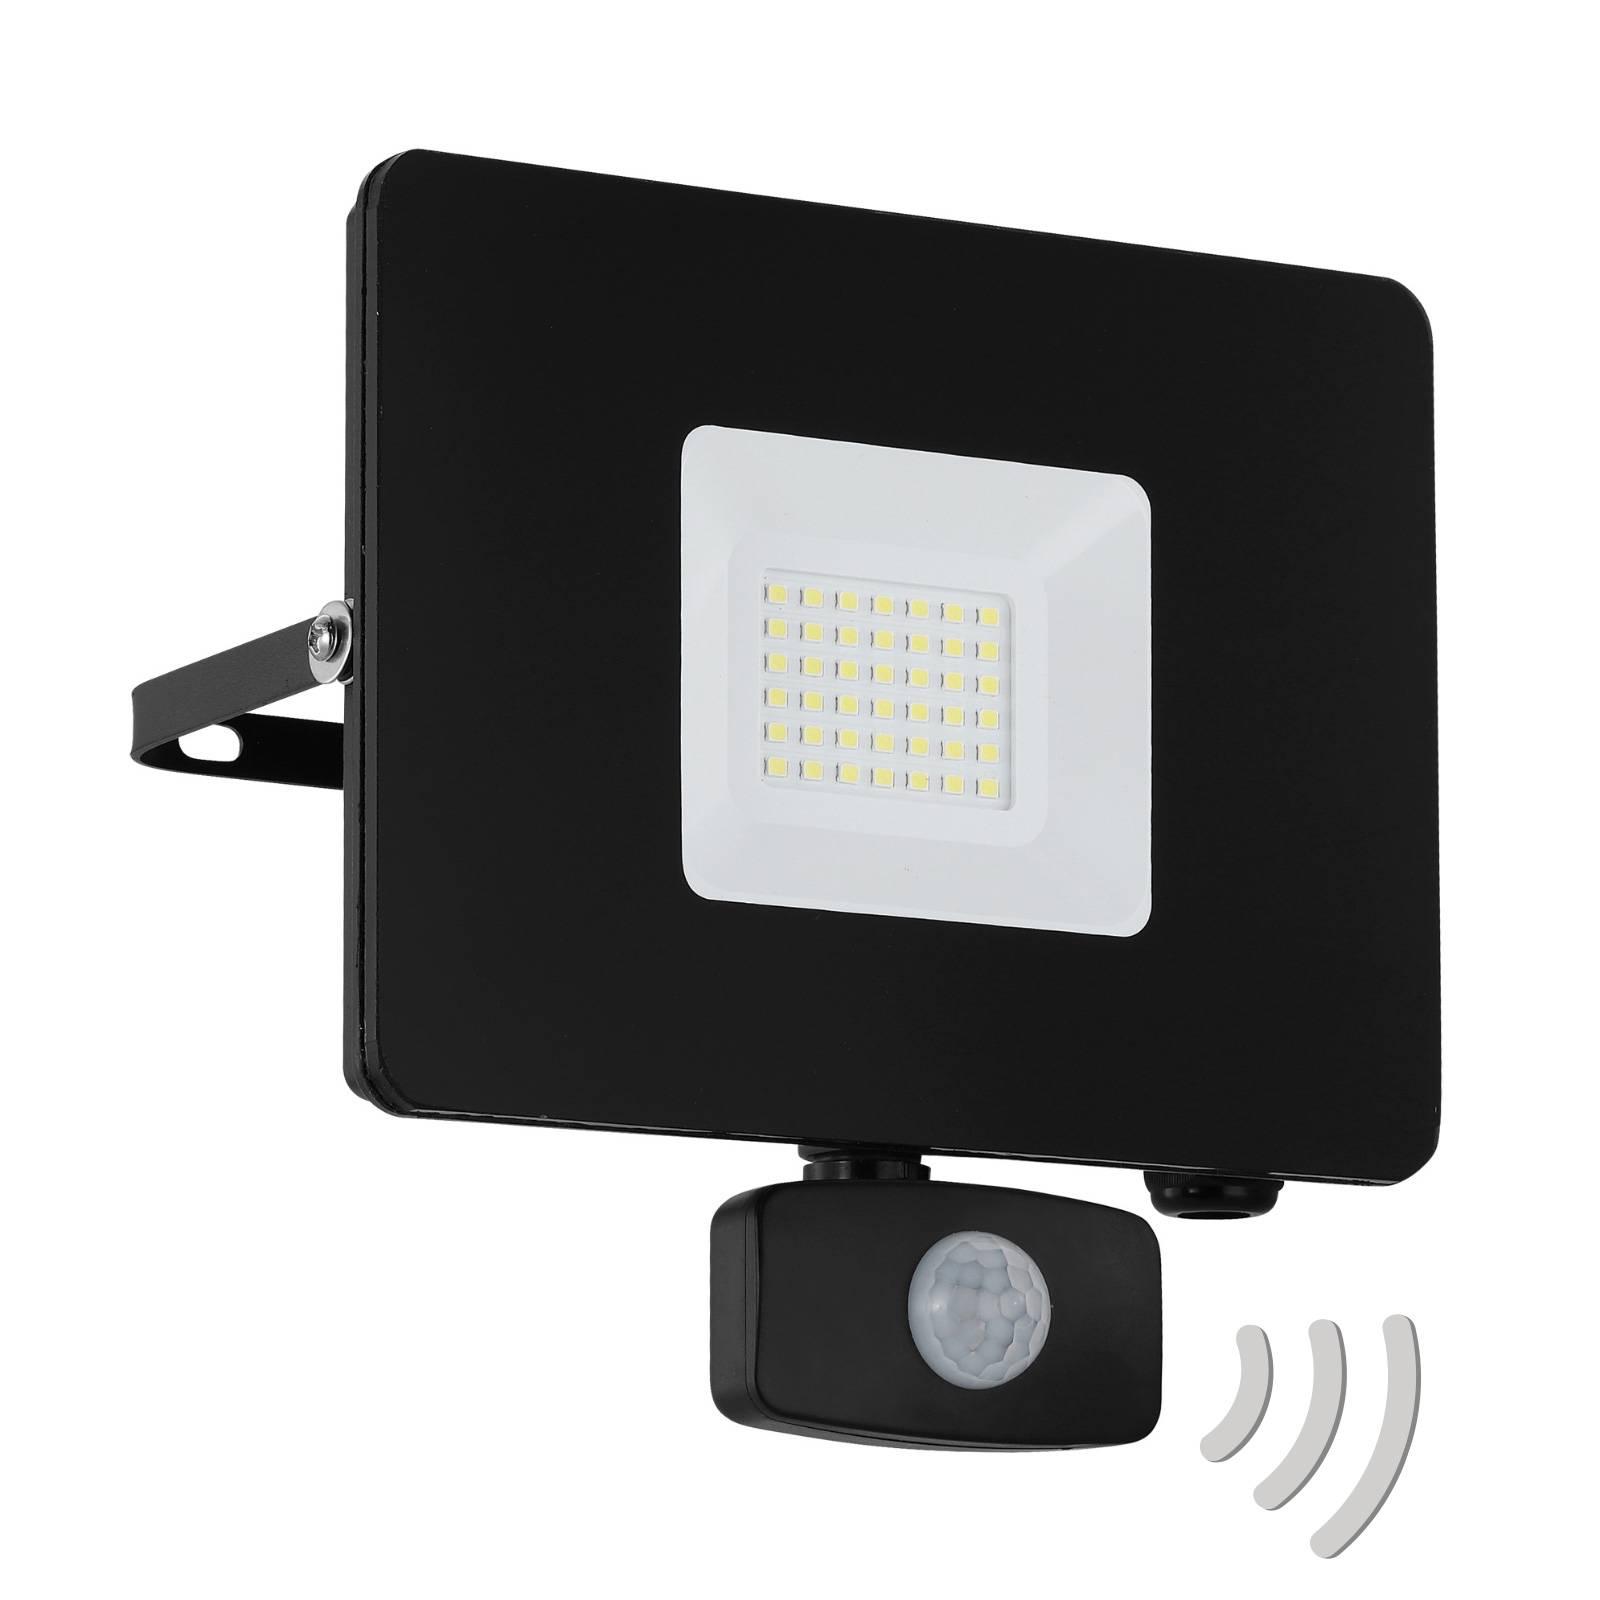 LED-kohdevalaisin ulos Faedo 3, tunnistin, 30 W